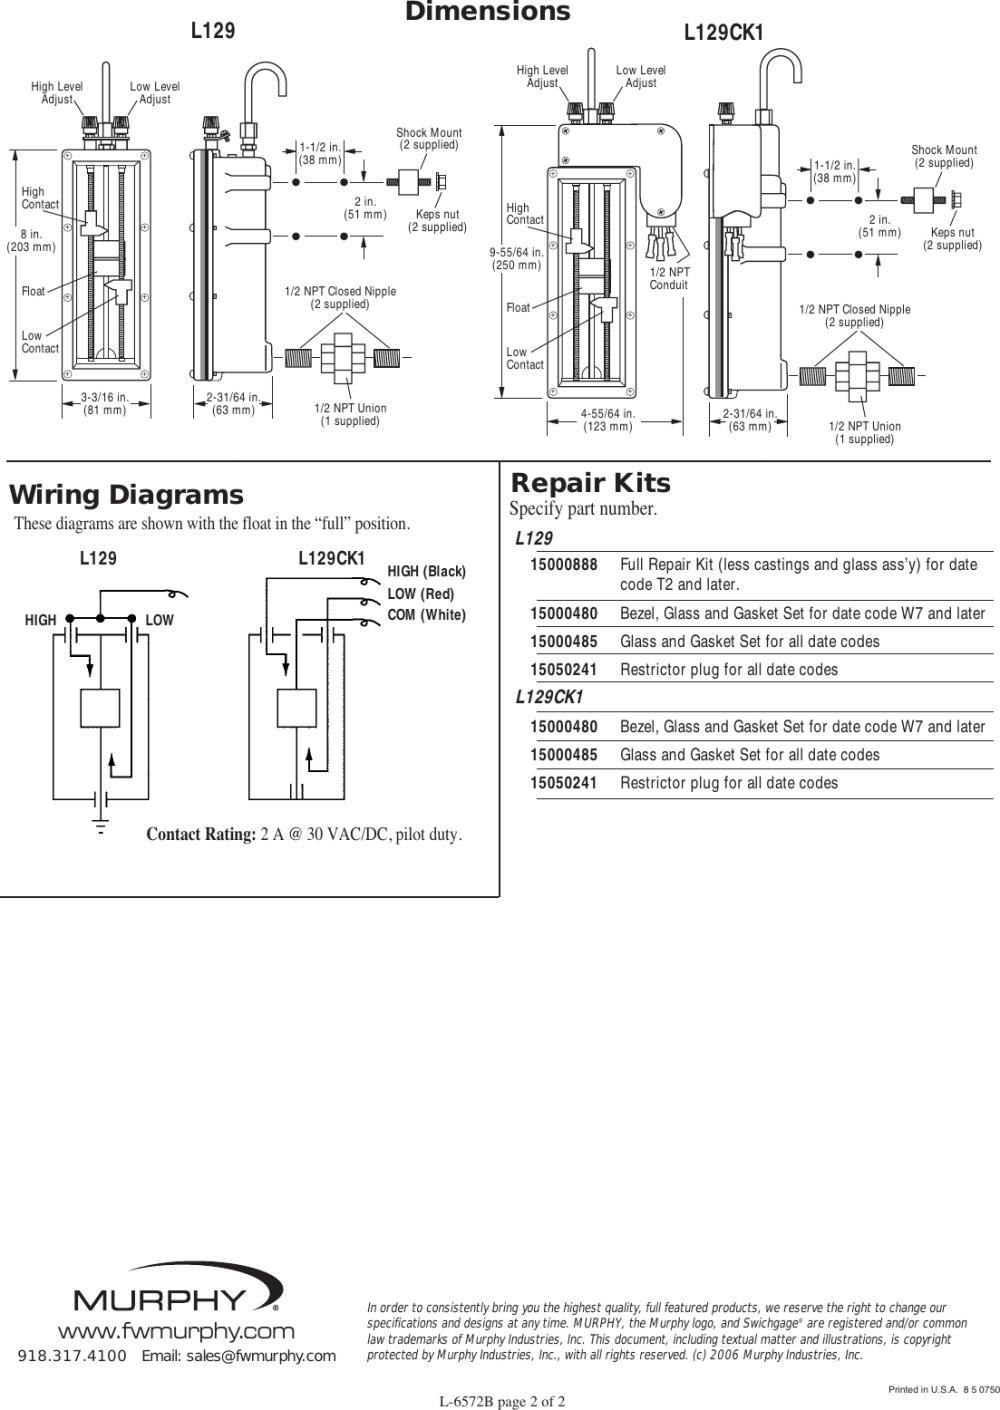 medium resolution of murphy lube level swichgage instrument l129 series users manual dual switch wiring diagram murphy switch wiring